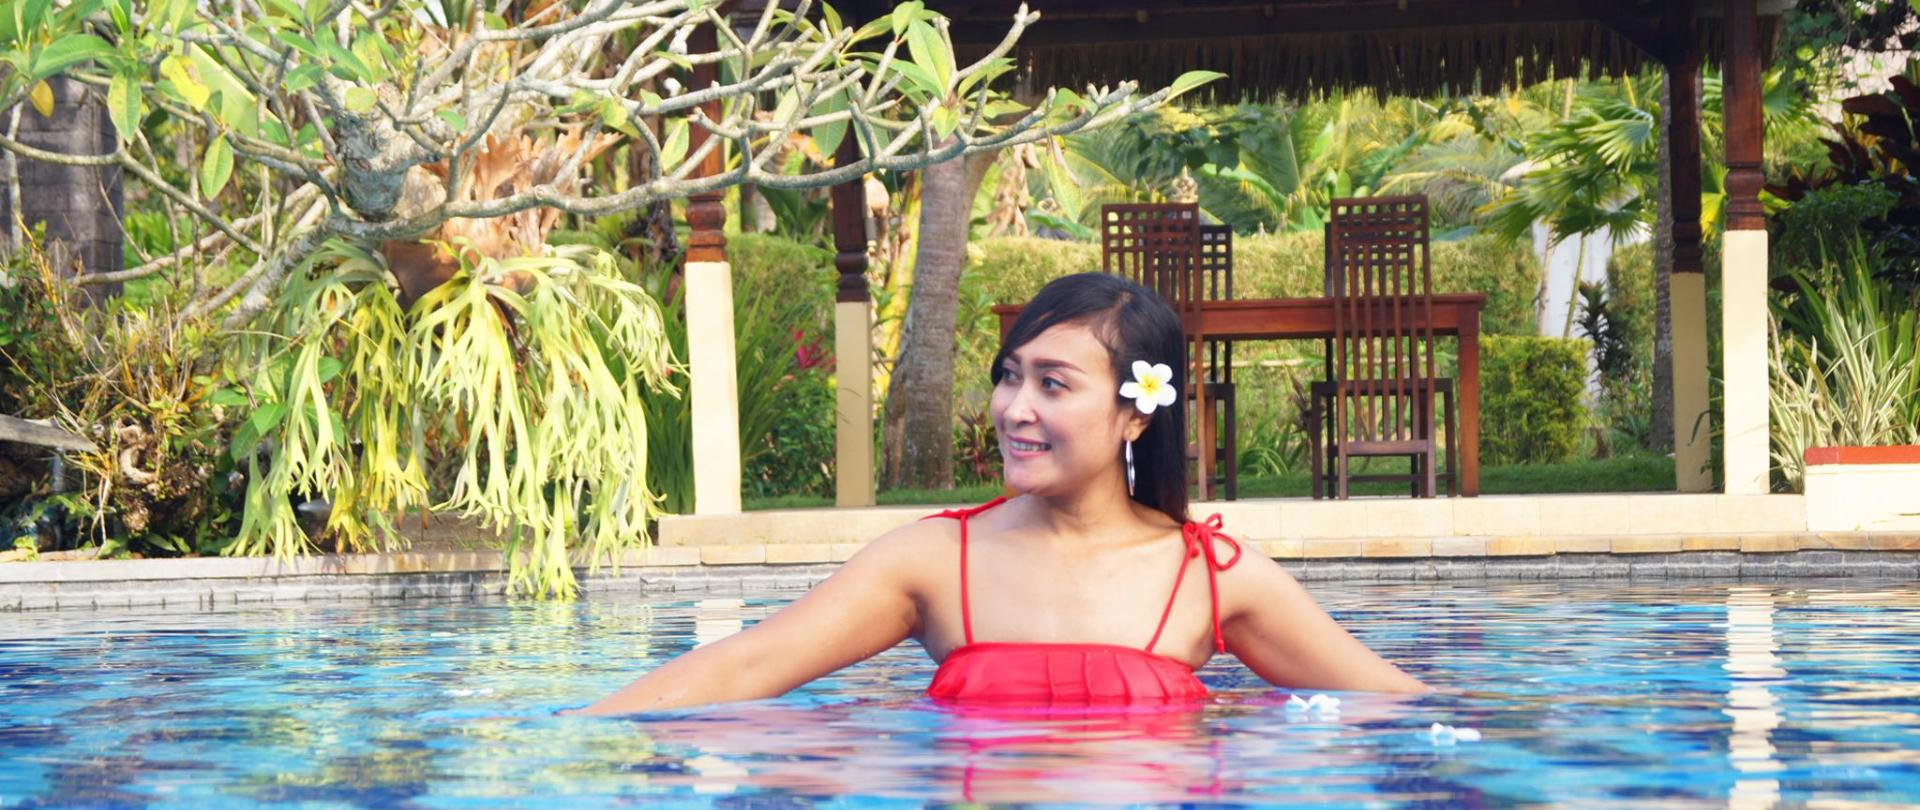 z14 Lady Pool.jpg